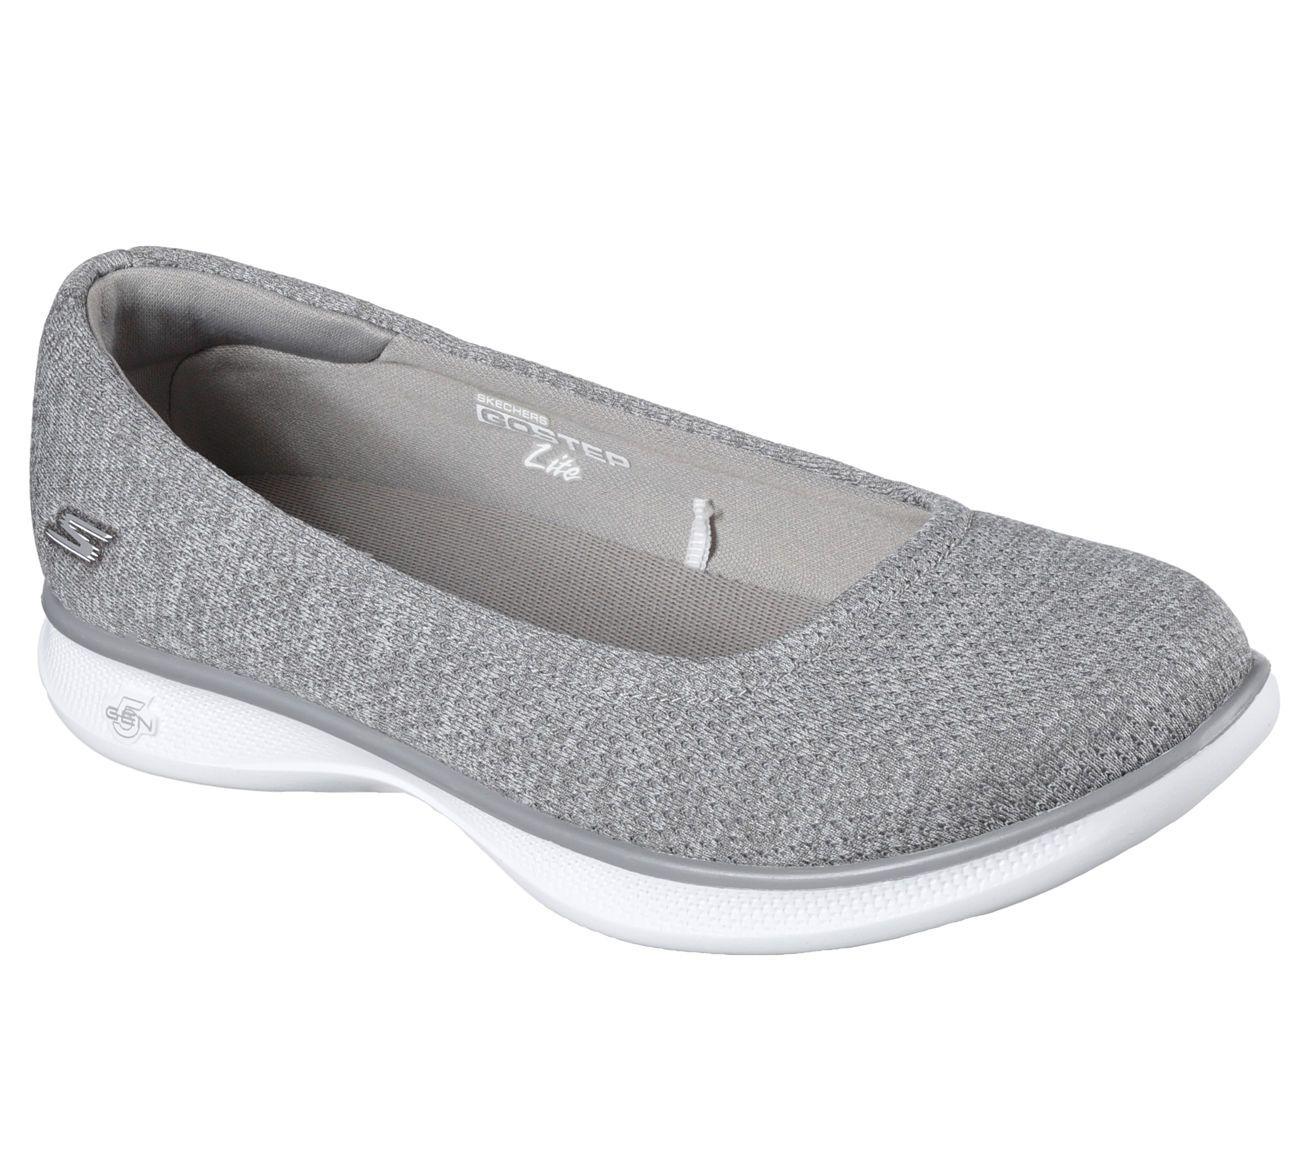 14479 Gray Skechers shoes Go Step Women Casual Comfort Walk Slip On Jersey  Knit